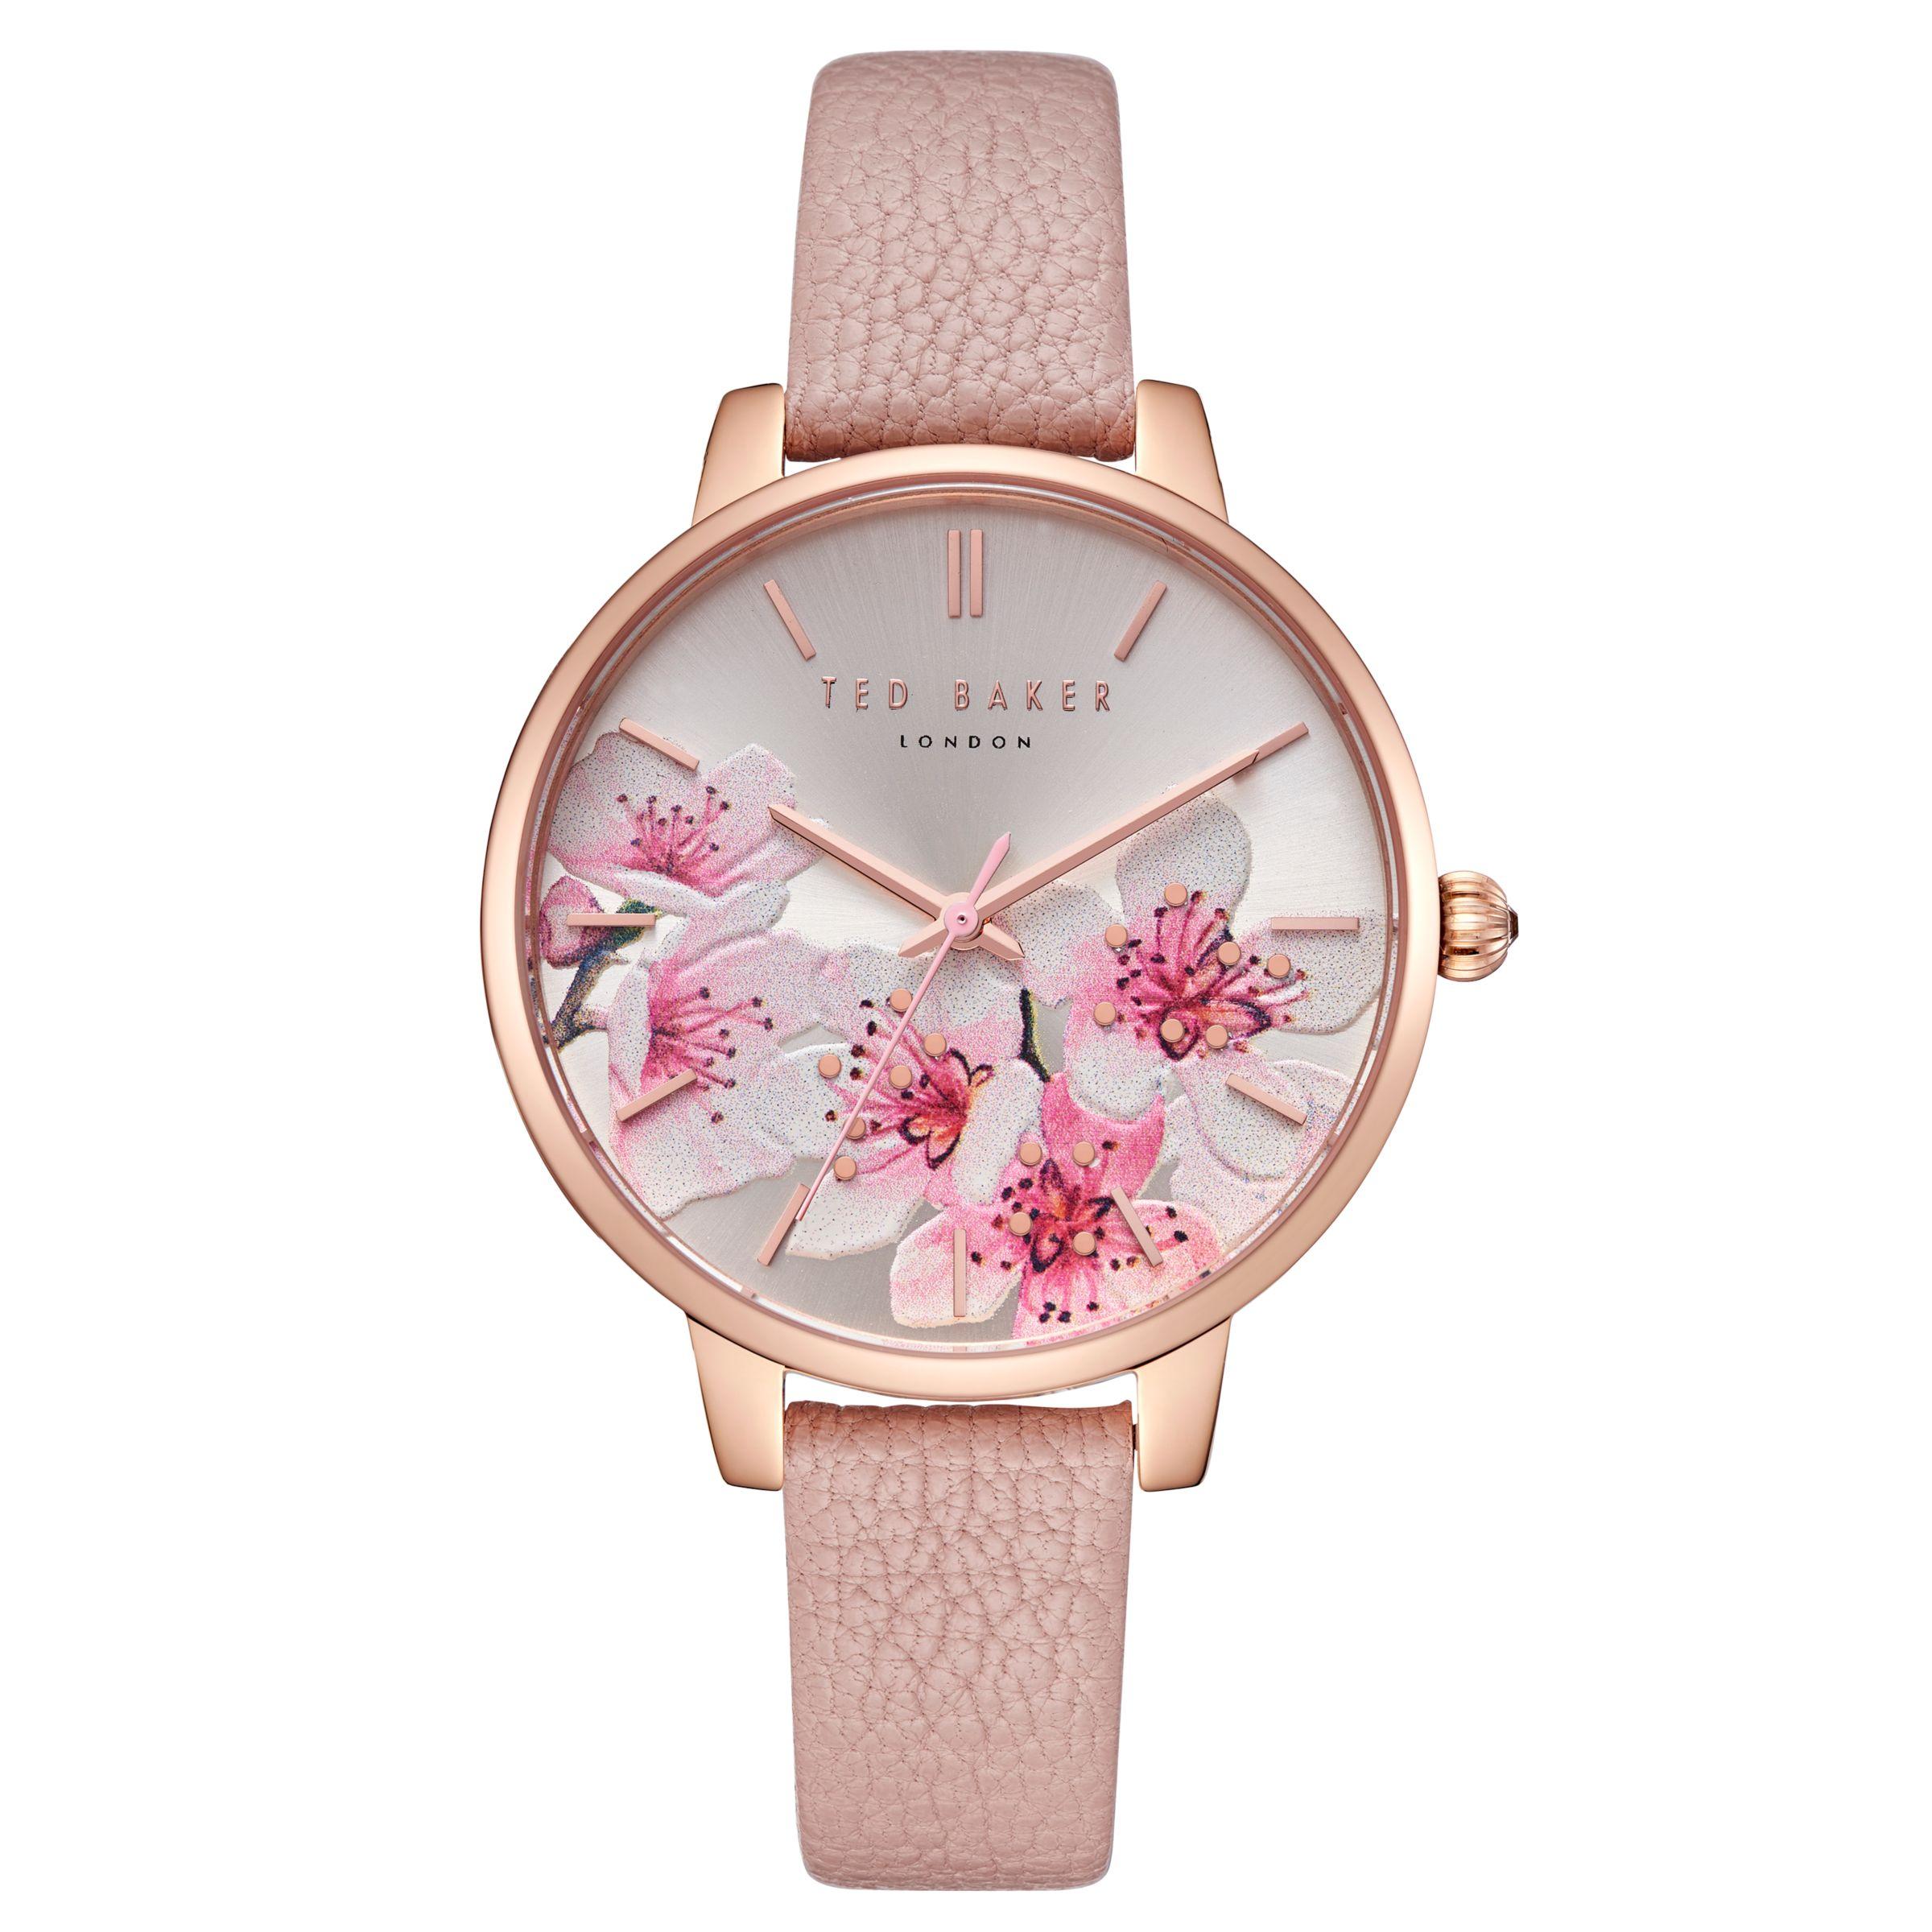 ecf1d87b77aa Ted Baker TE50005004 Women s Kate Leather Strap Watch